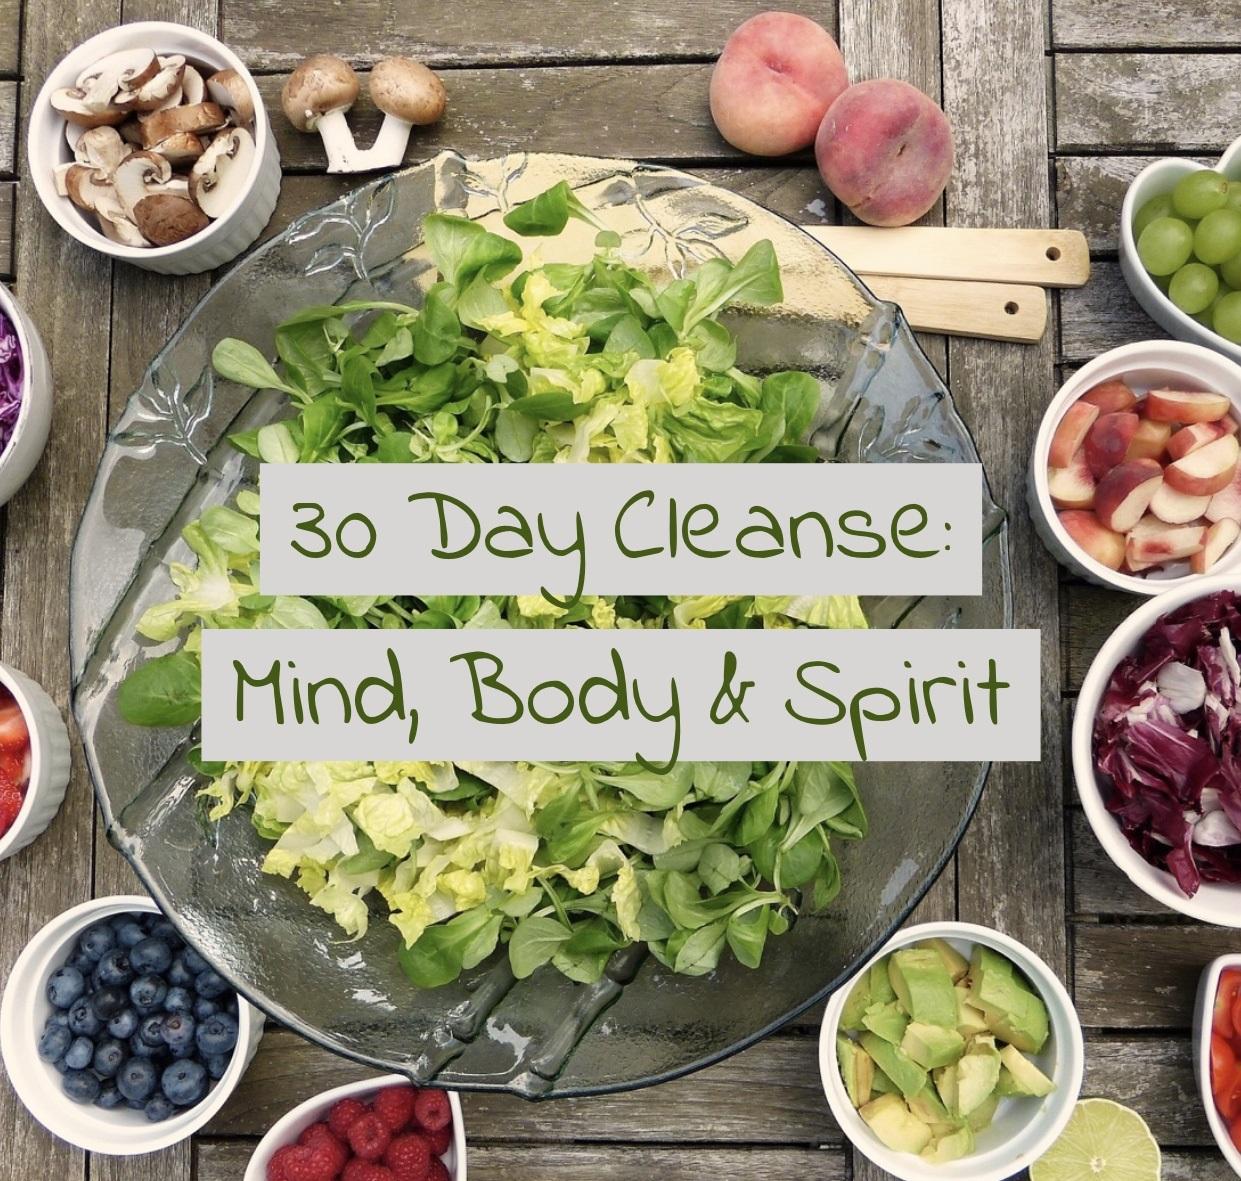 30 Day Cleanse.jpg